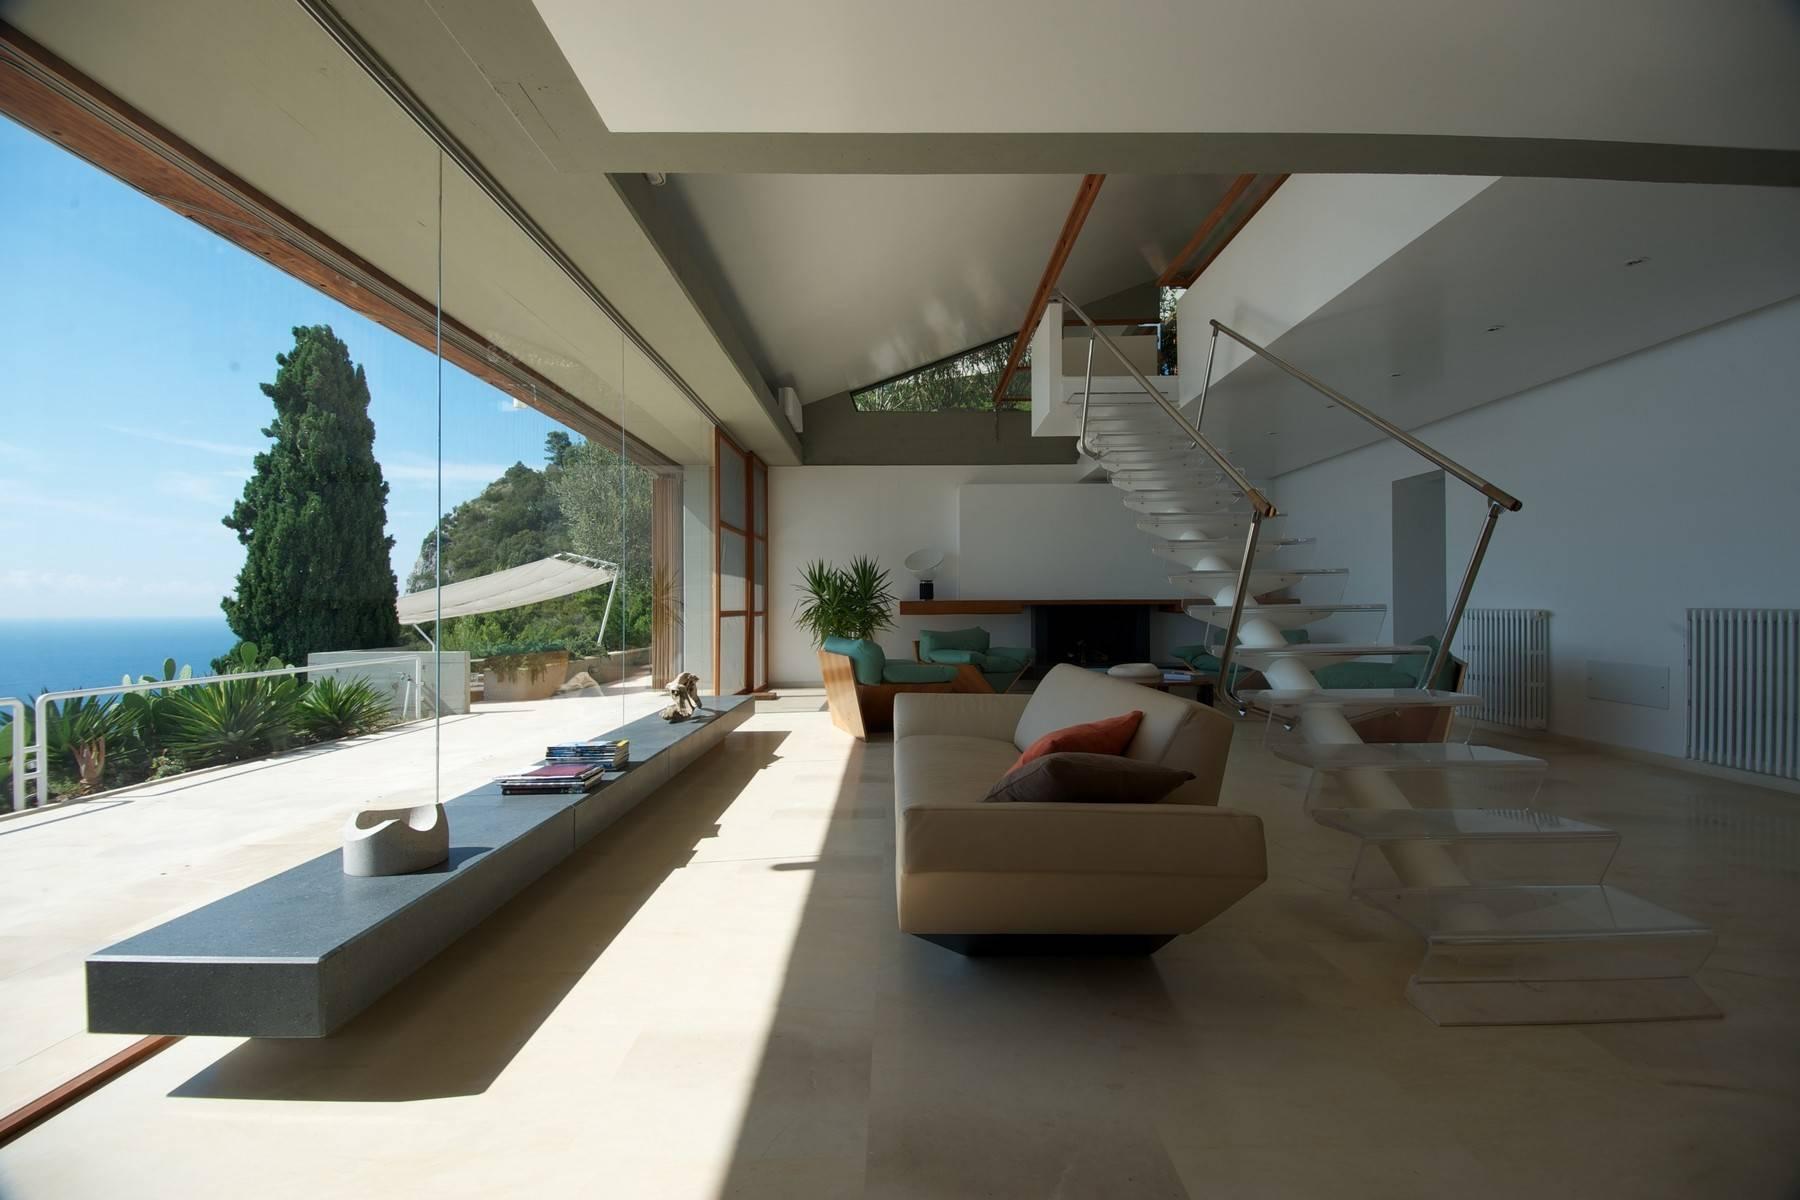 Villa in Vendita a Monte Argentario via panoramica